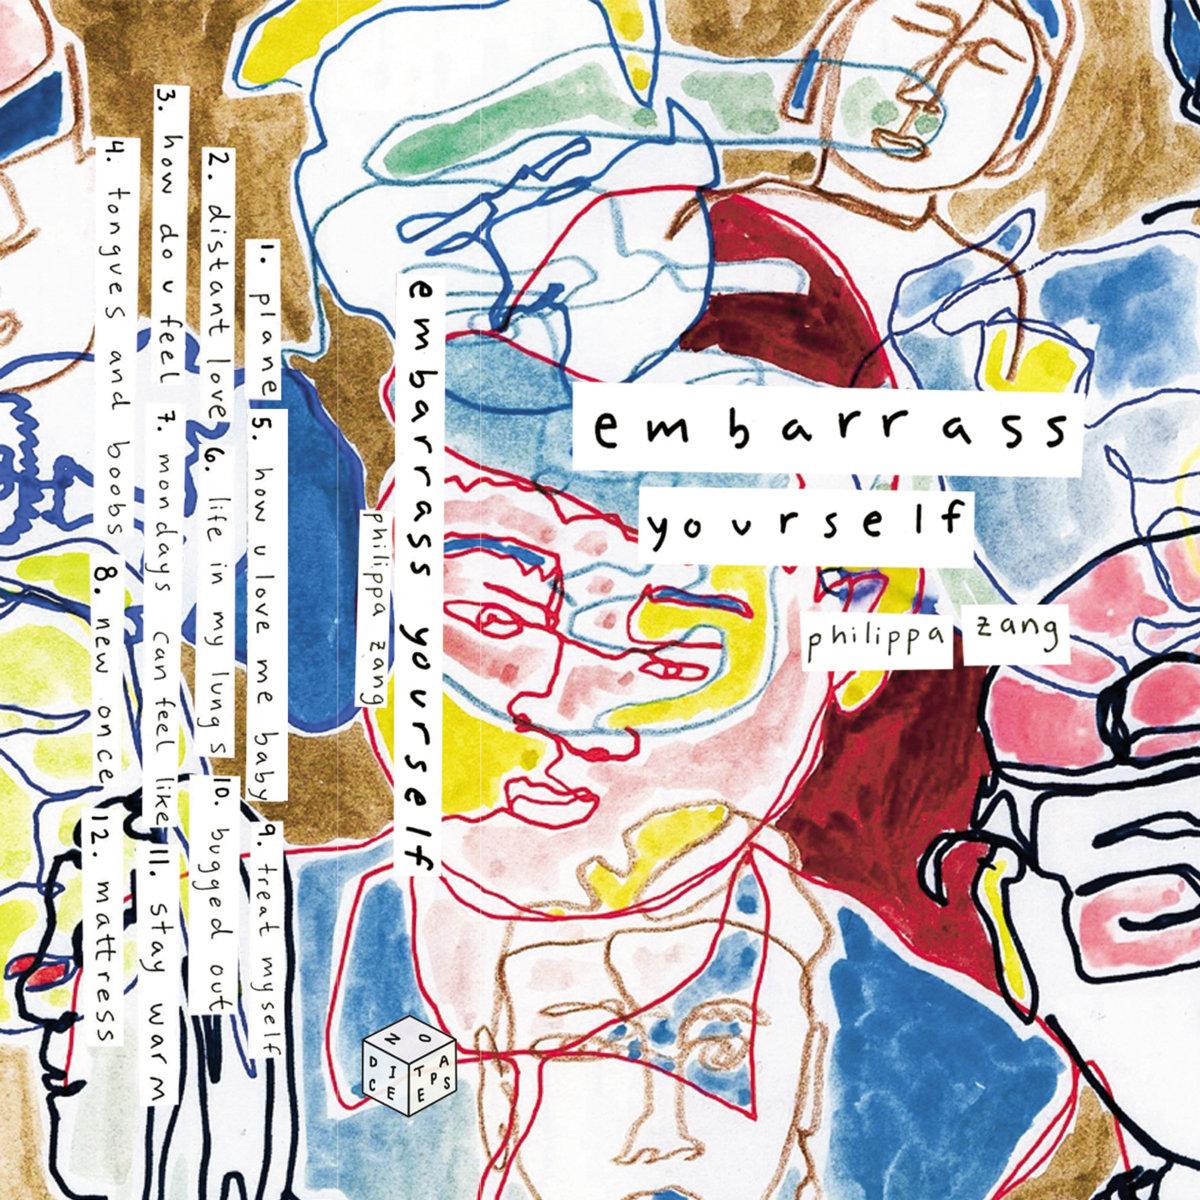 embarrass yourself philippa zang album art